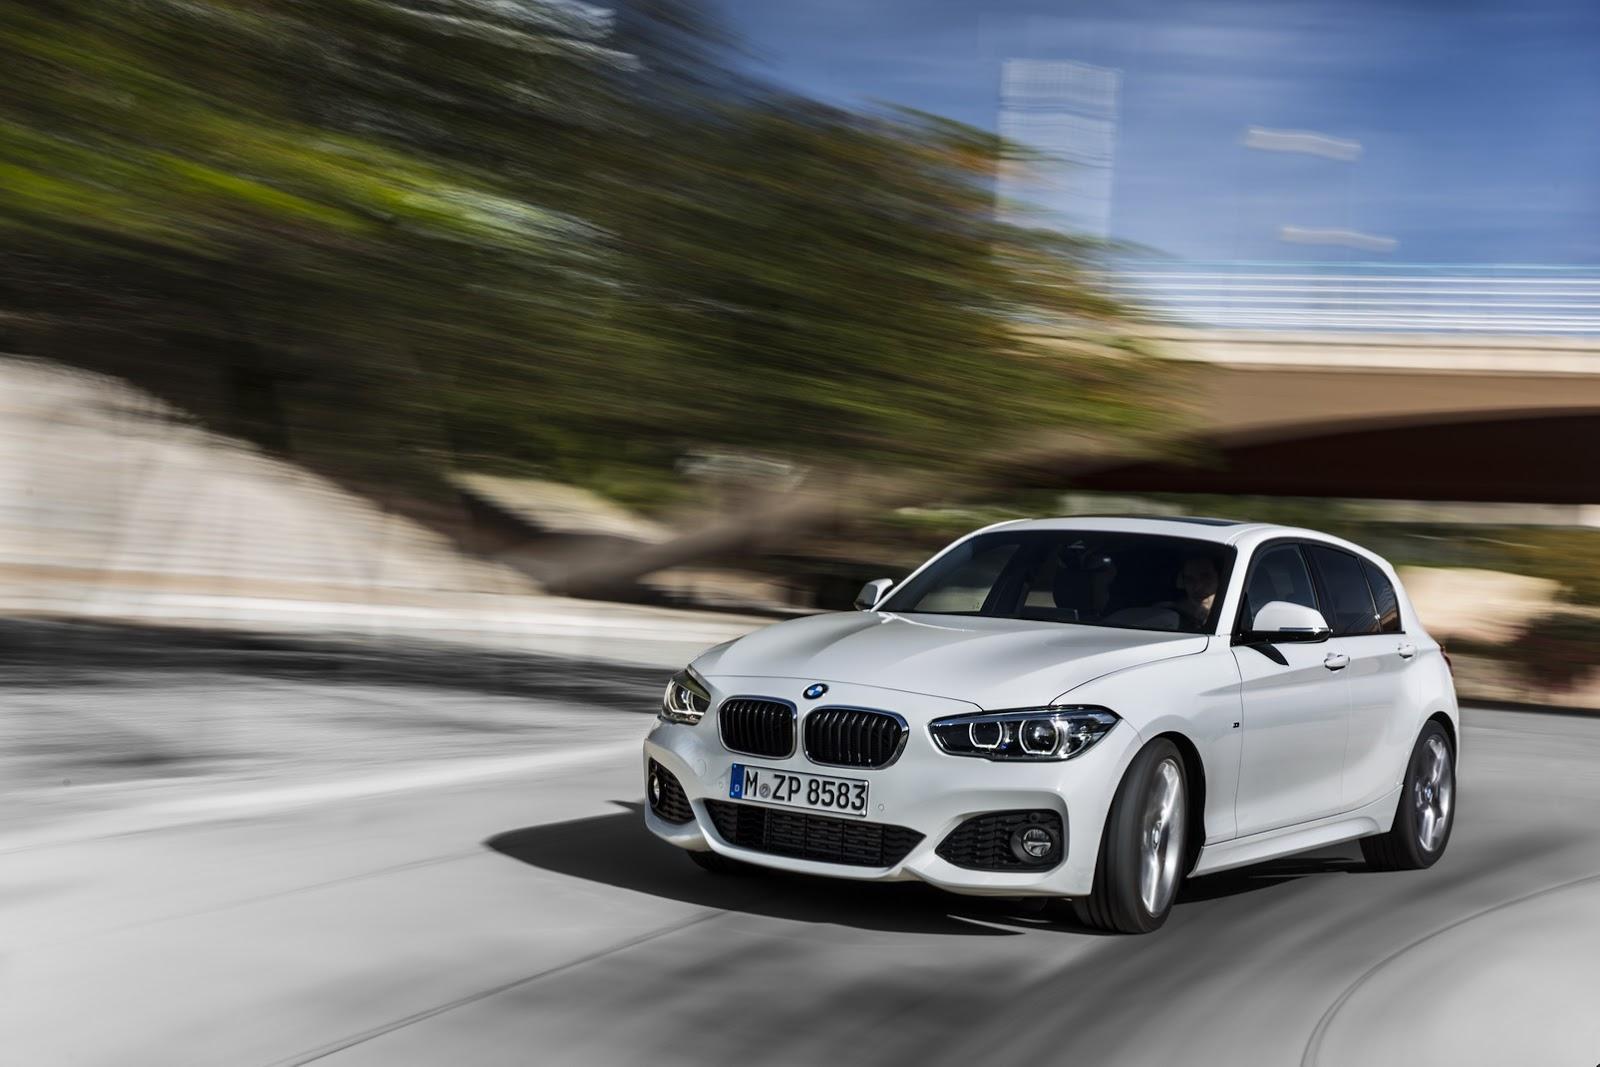 BMW Seria 1 facelift 2015 - floteauto 4